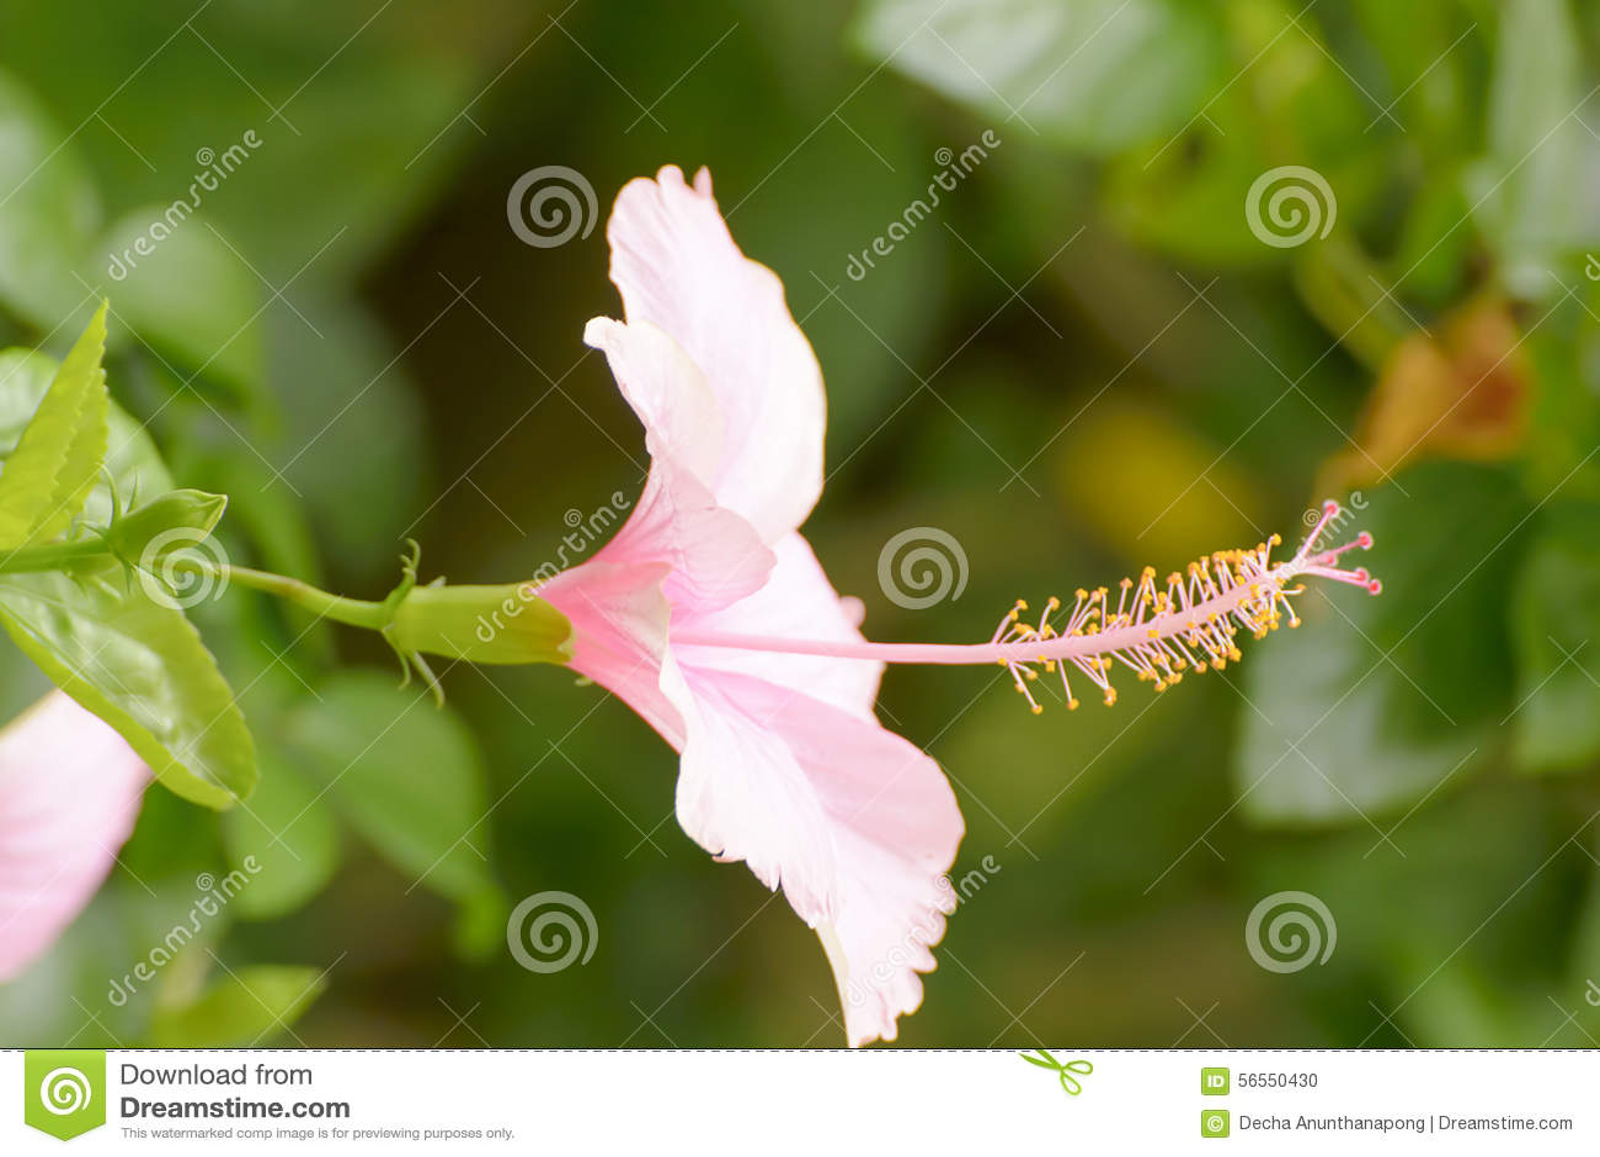 Download Hibiscus είναι ένα γένος των ανθίζοντας φυτών στη Mallow οικογένεια, Malvaceae Στοκ Εικόνες - εικόνα από οικογένεια, εκατό: 56550430